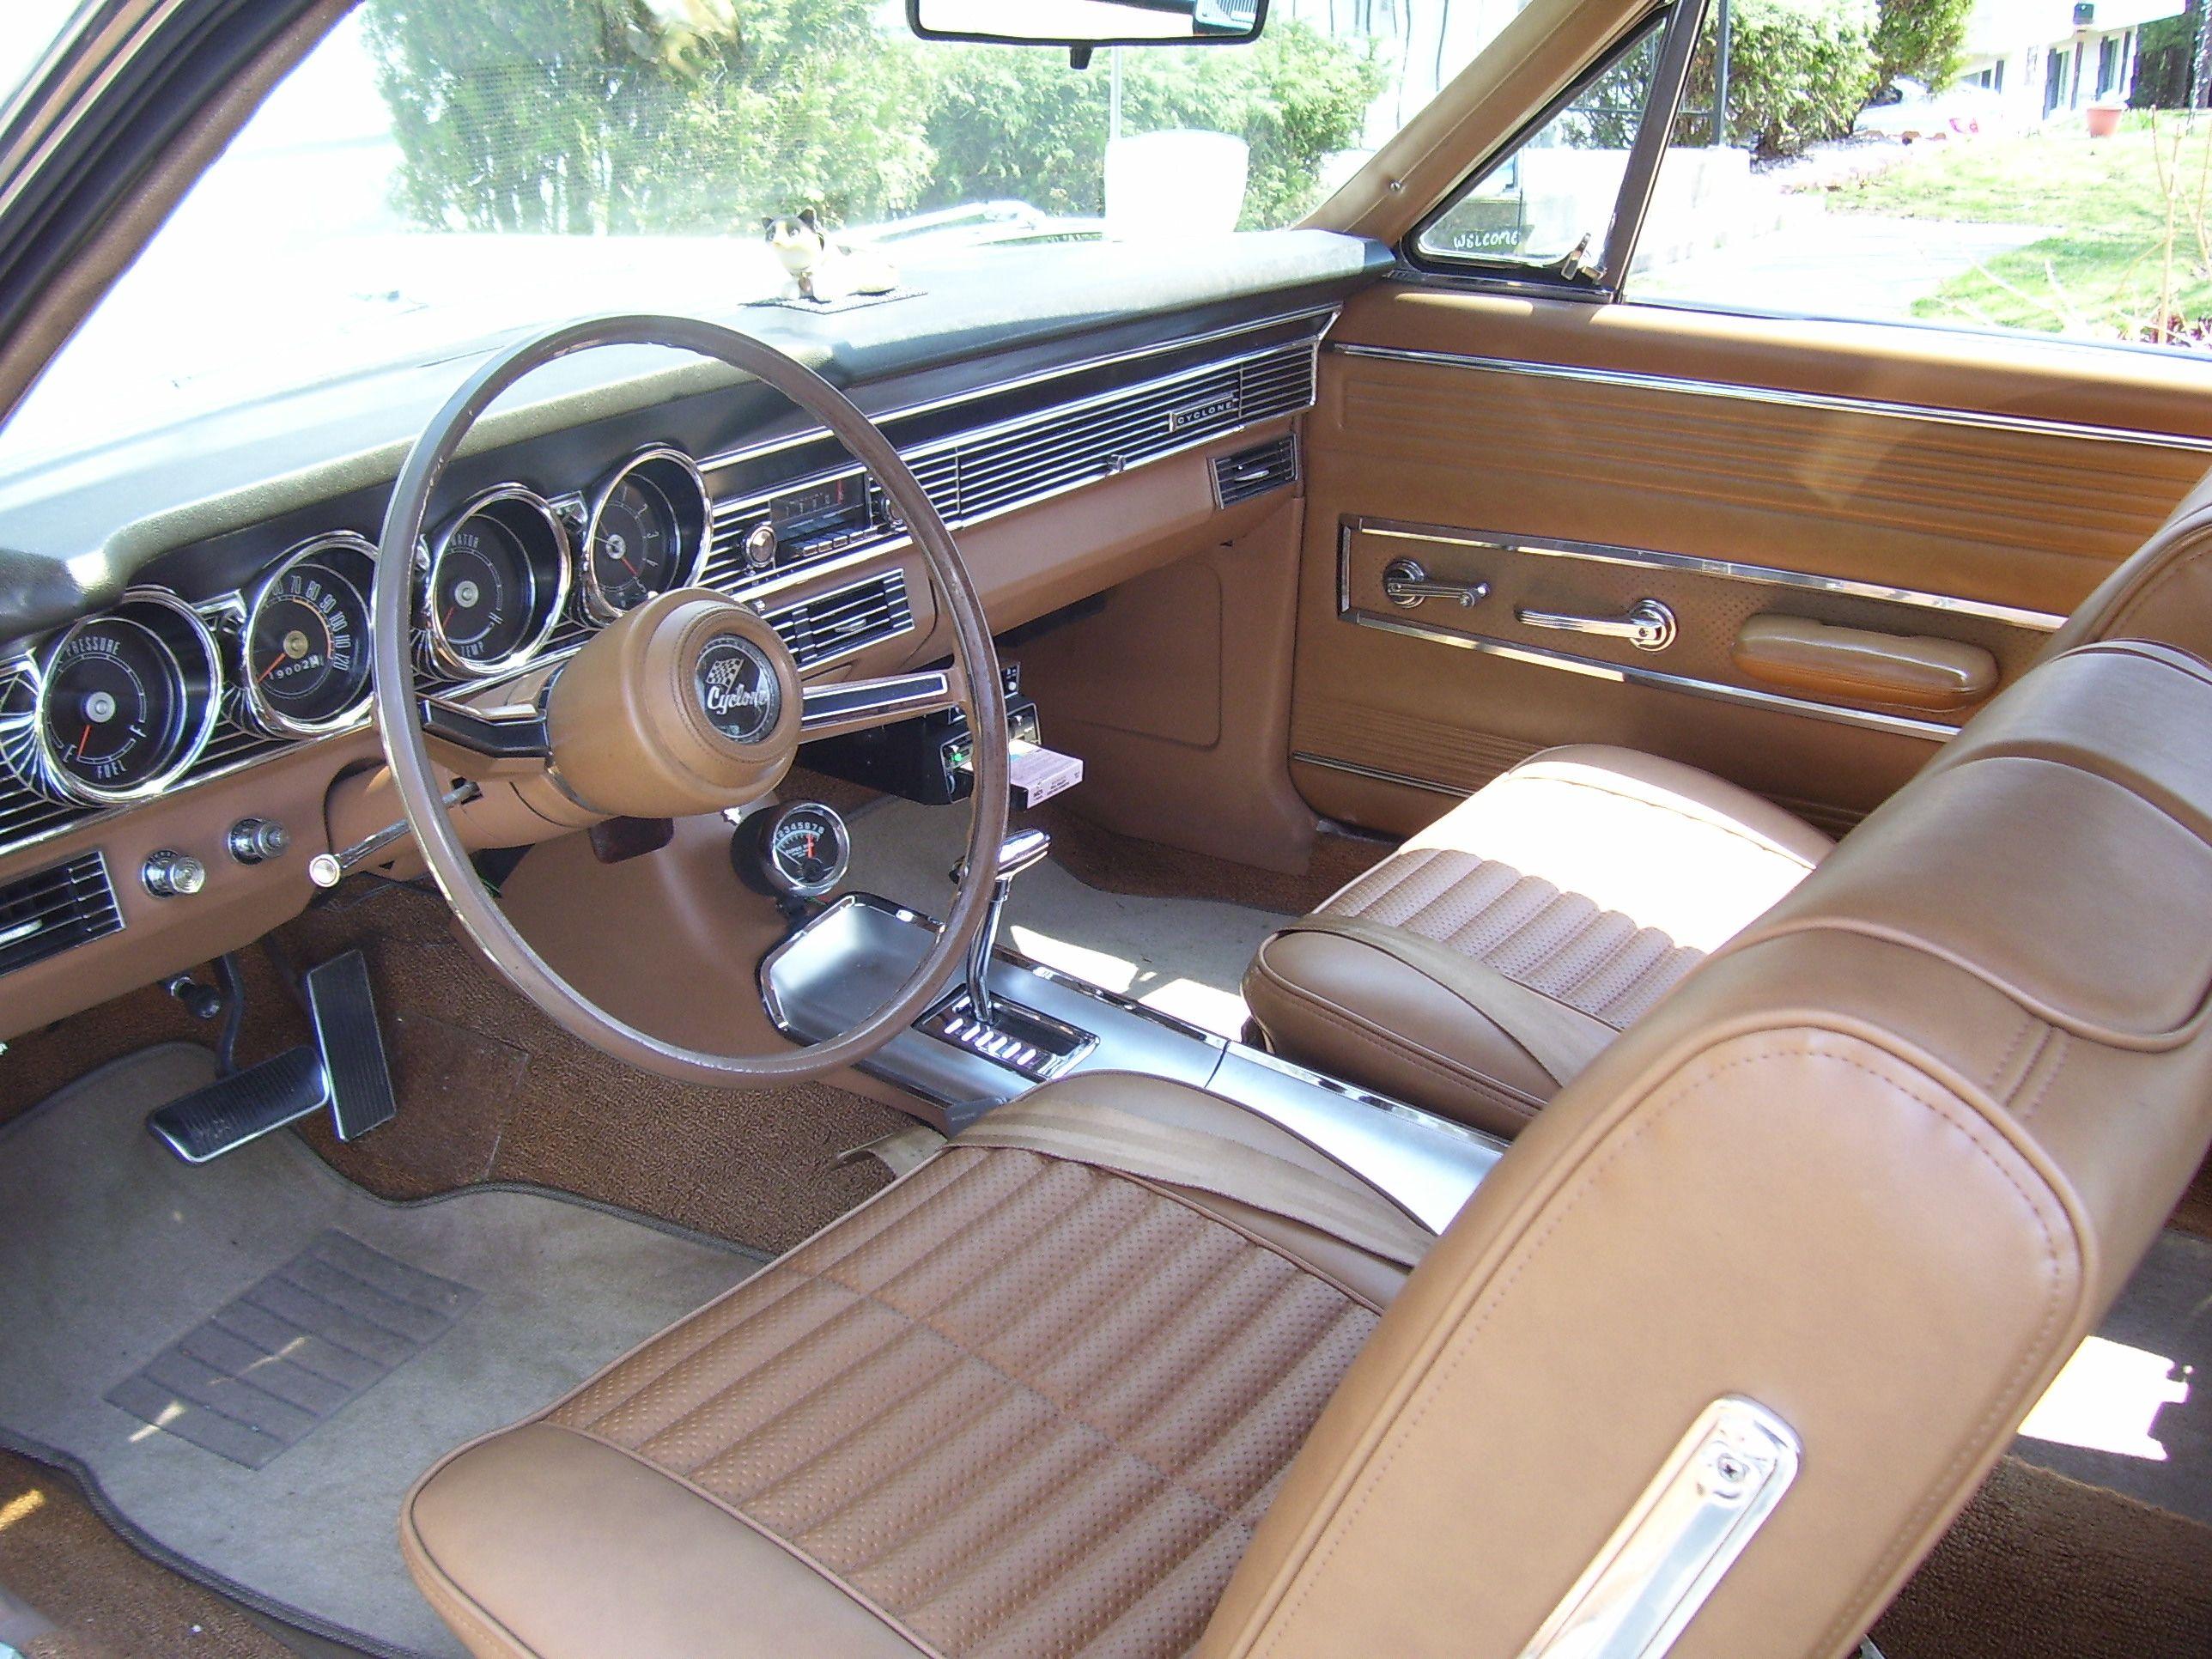 1967 Mercury Comet Cyclone Interior Comet Mercury Cars Car Rover